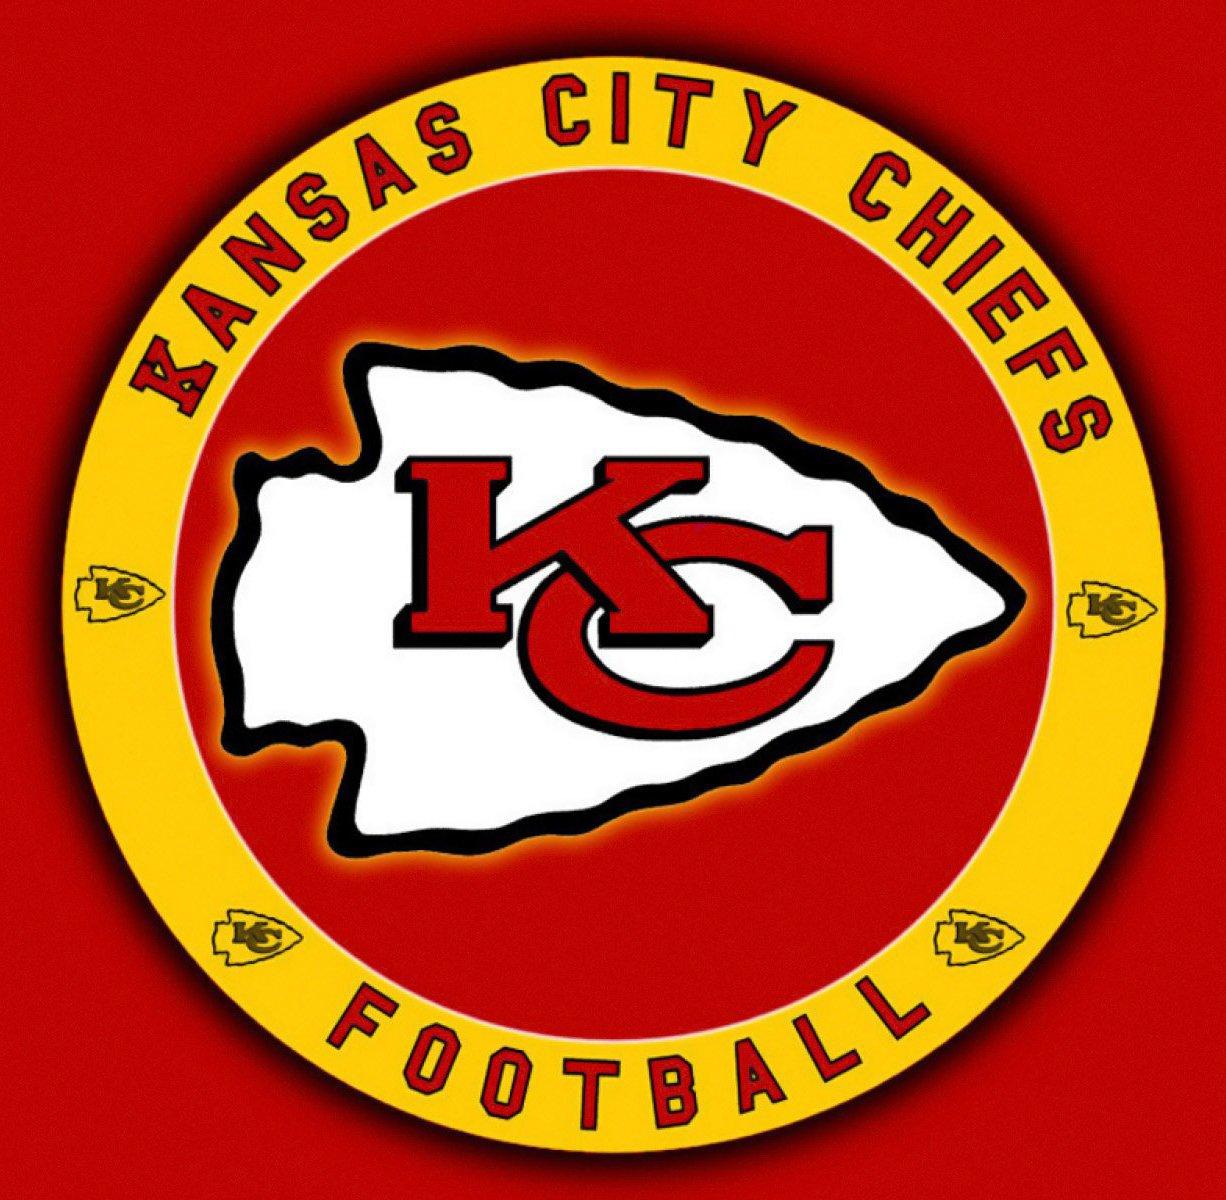 Kansas City Chiefs Logo, Chiefs Symbol Meaning, History ...